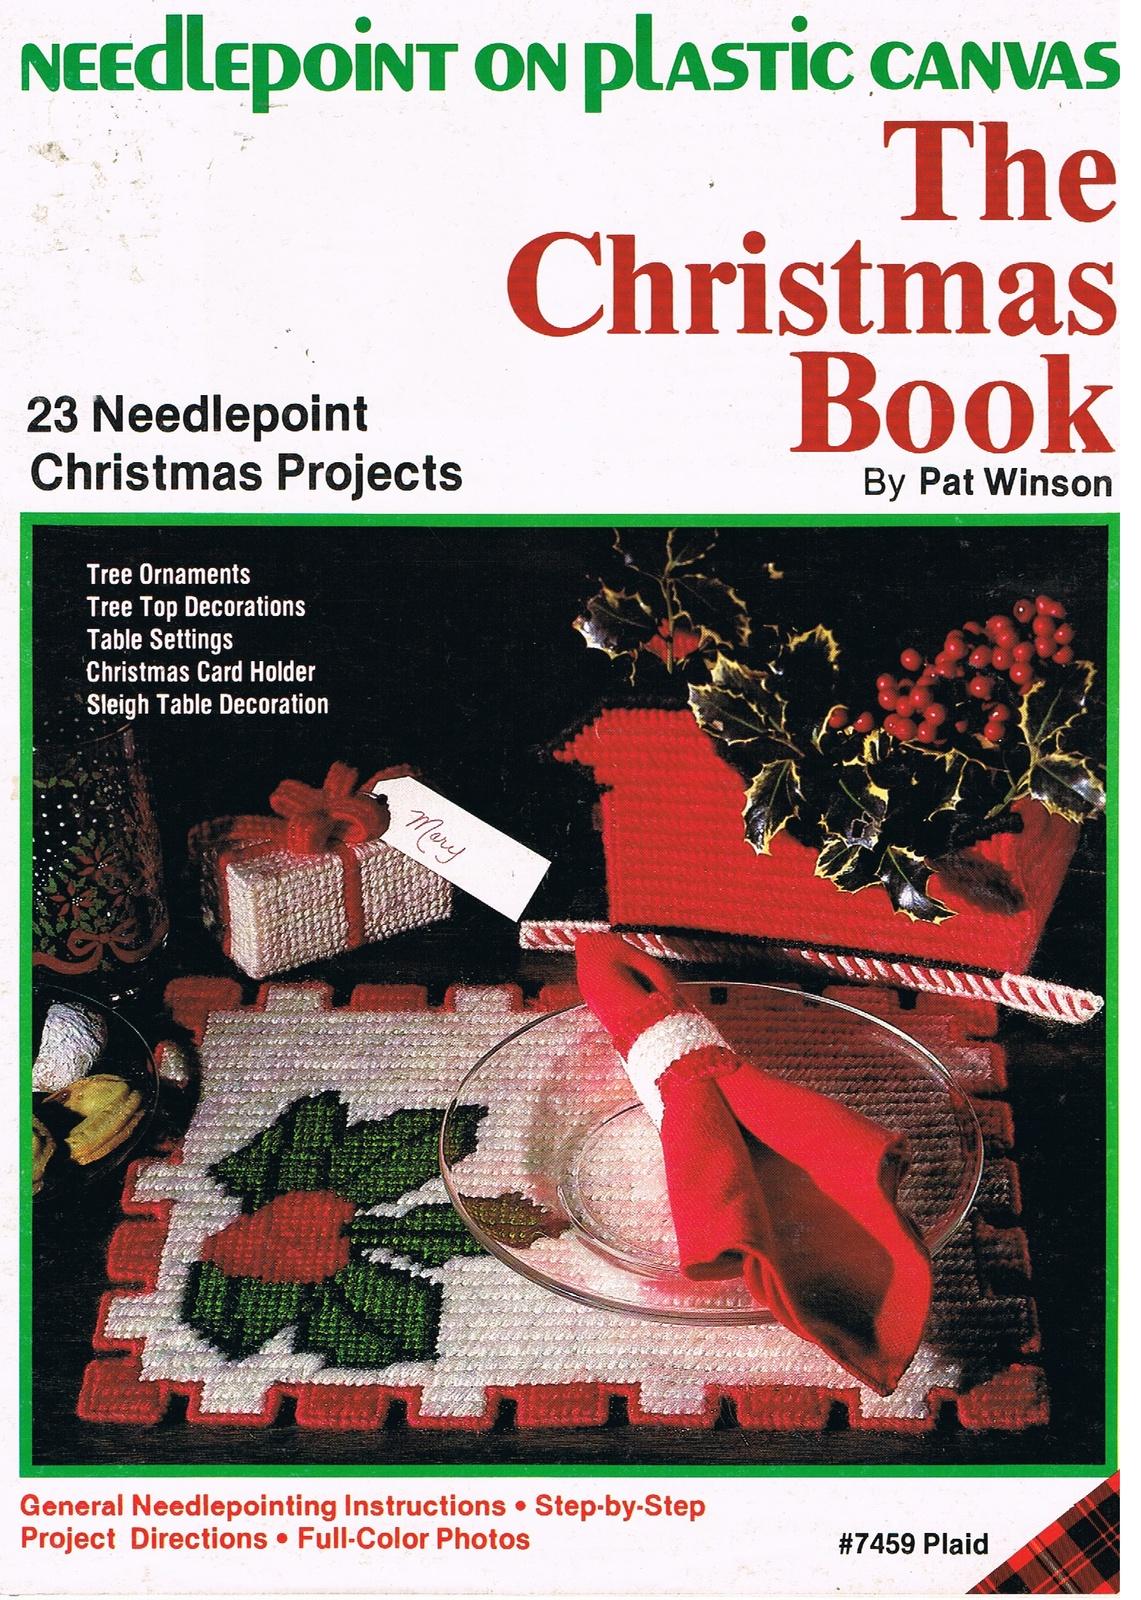 Needlepoint the christmas book